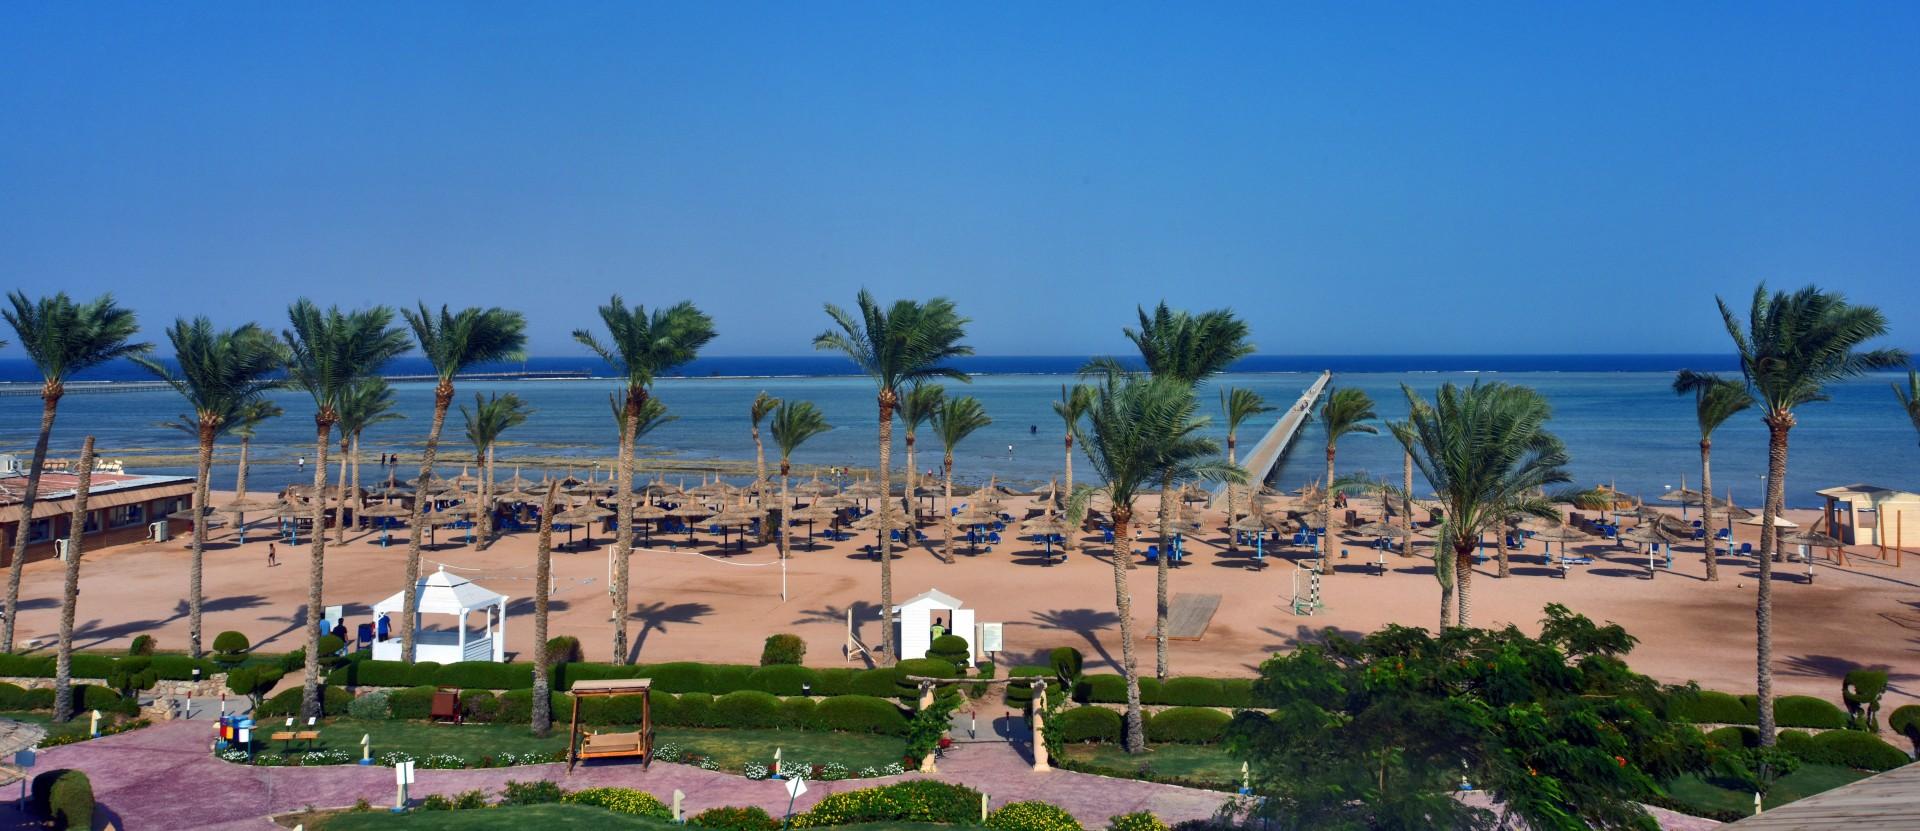 sea beach aqua park resort hotels in sharm el sheikh